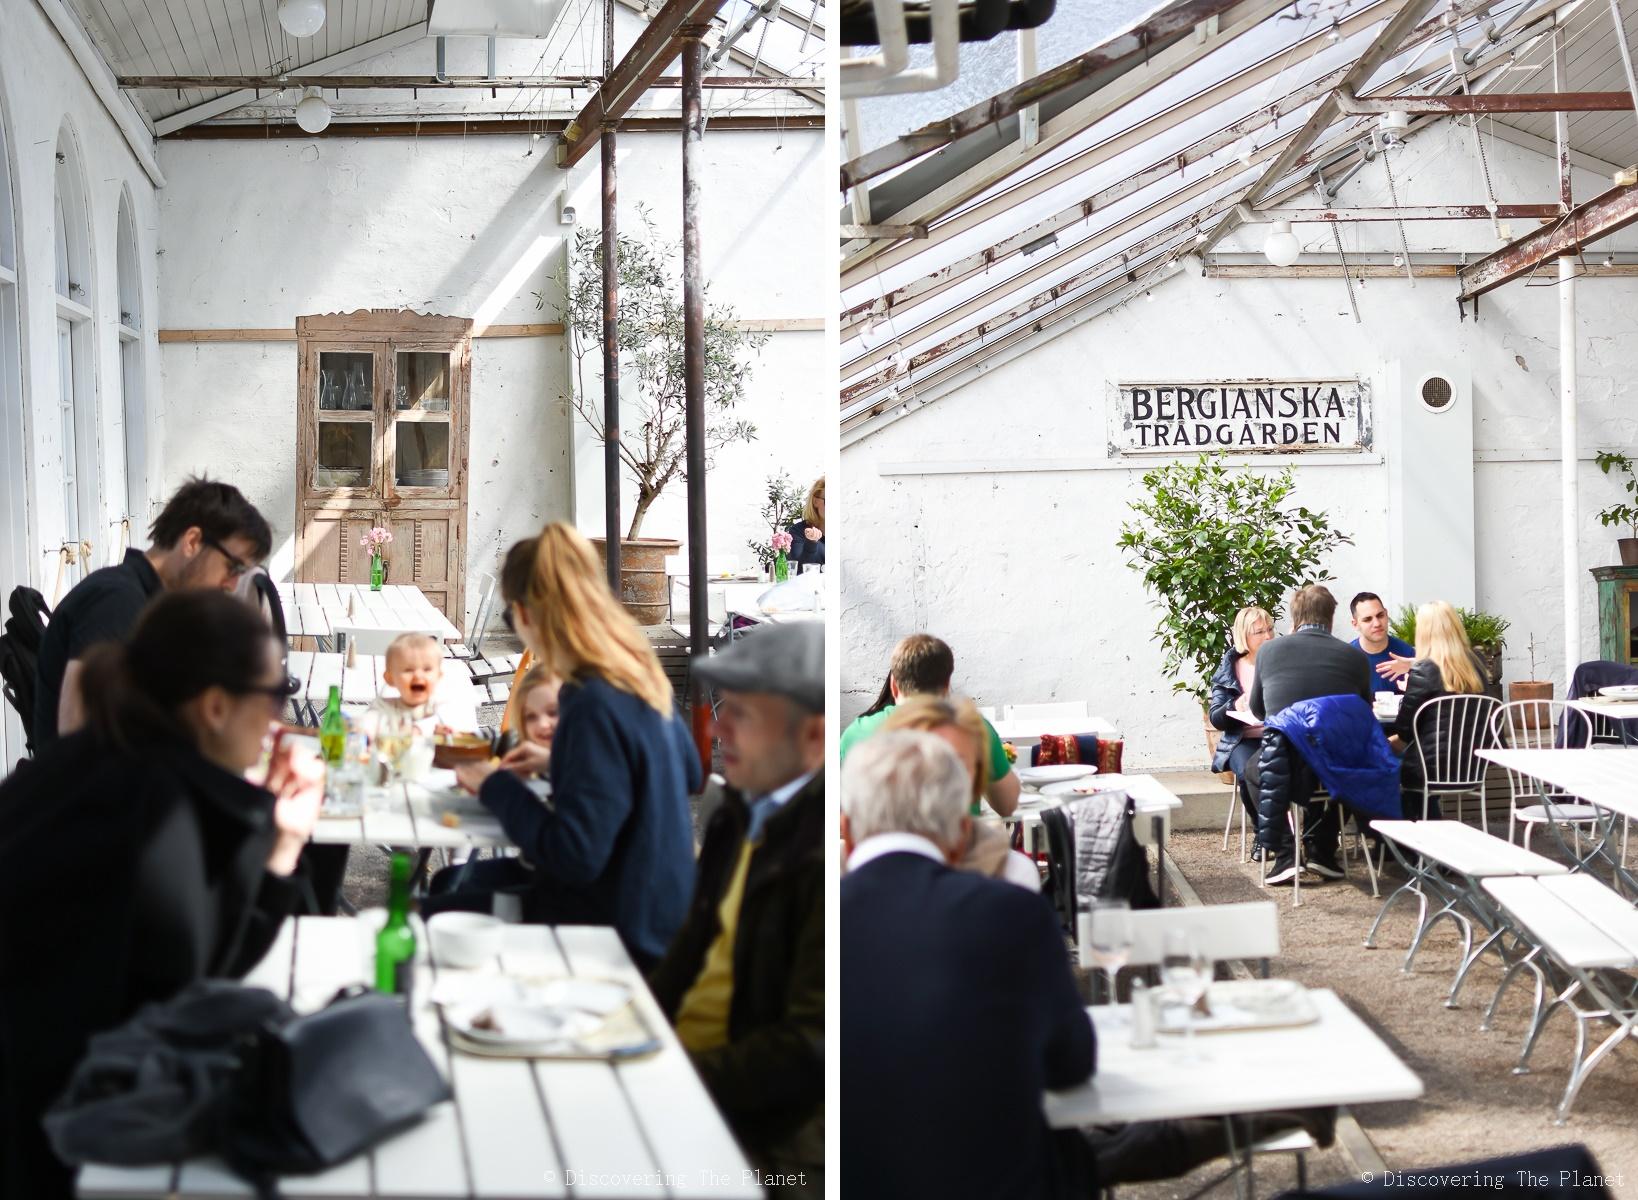 stockholm-bergianska-gamla-orangeriet-15-horz